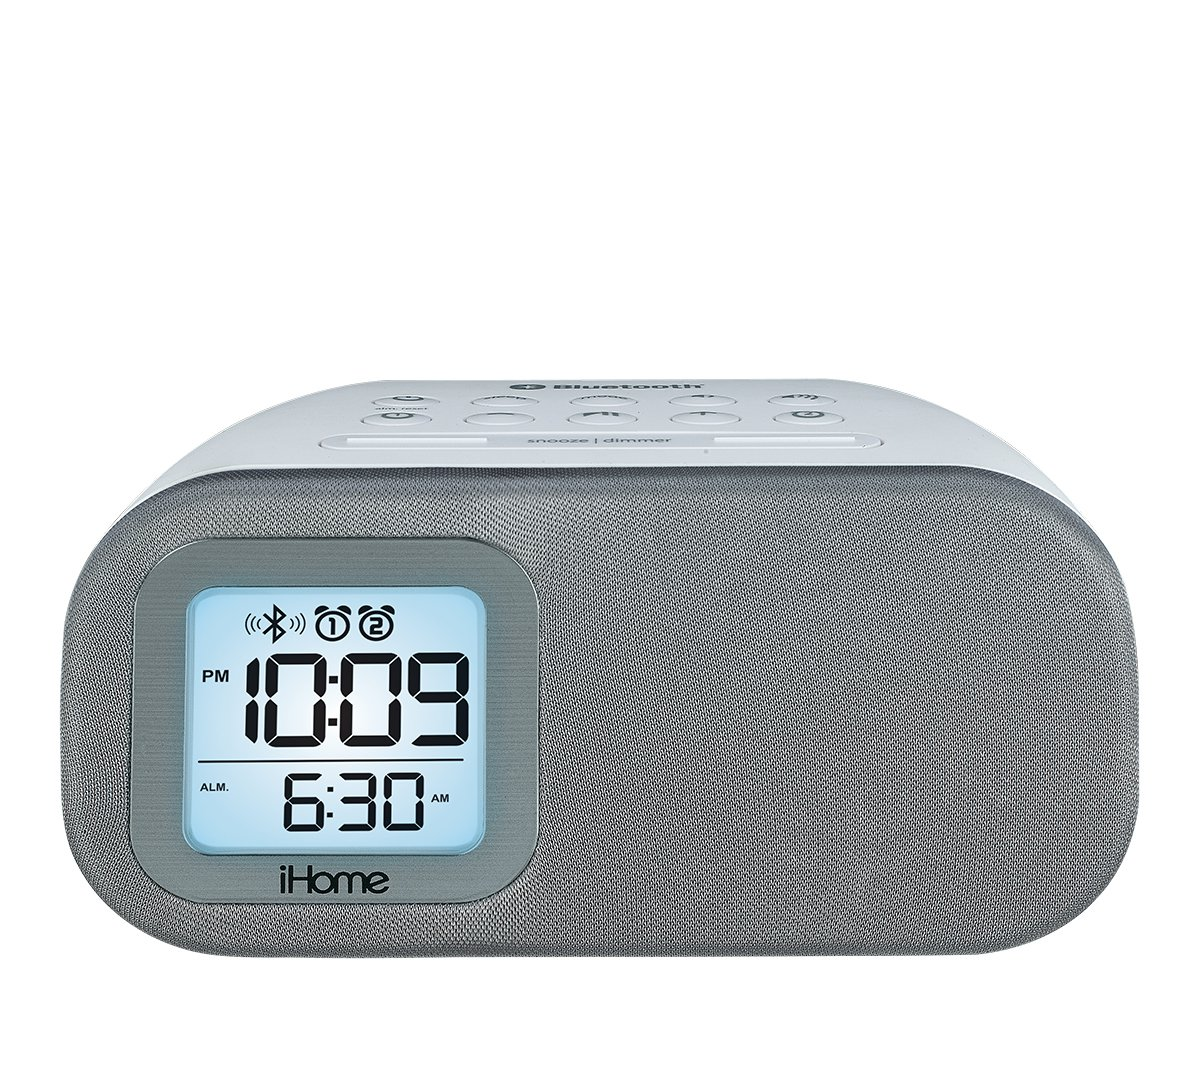 iHome iBT210 Bluetooth Dual Alarm FM Clock Radio